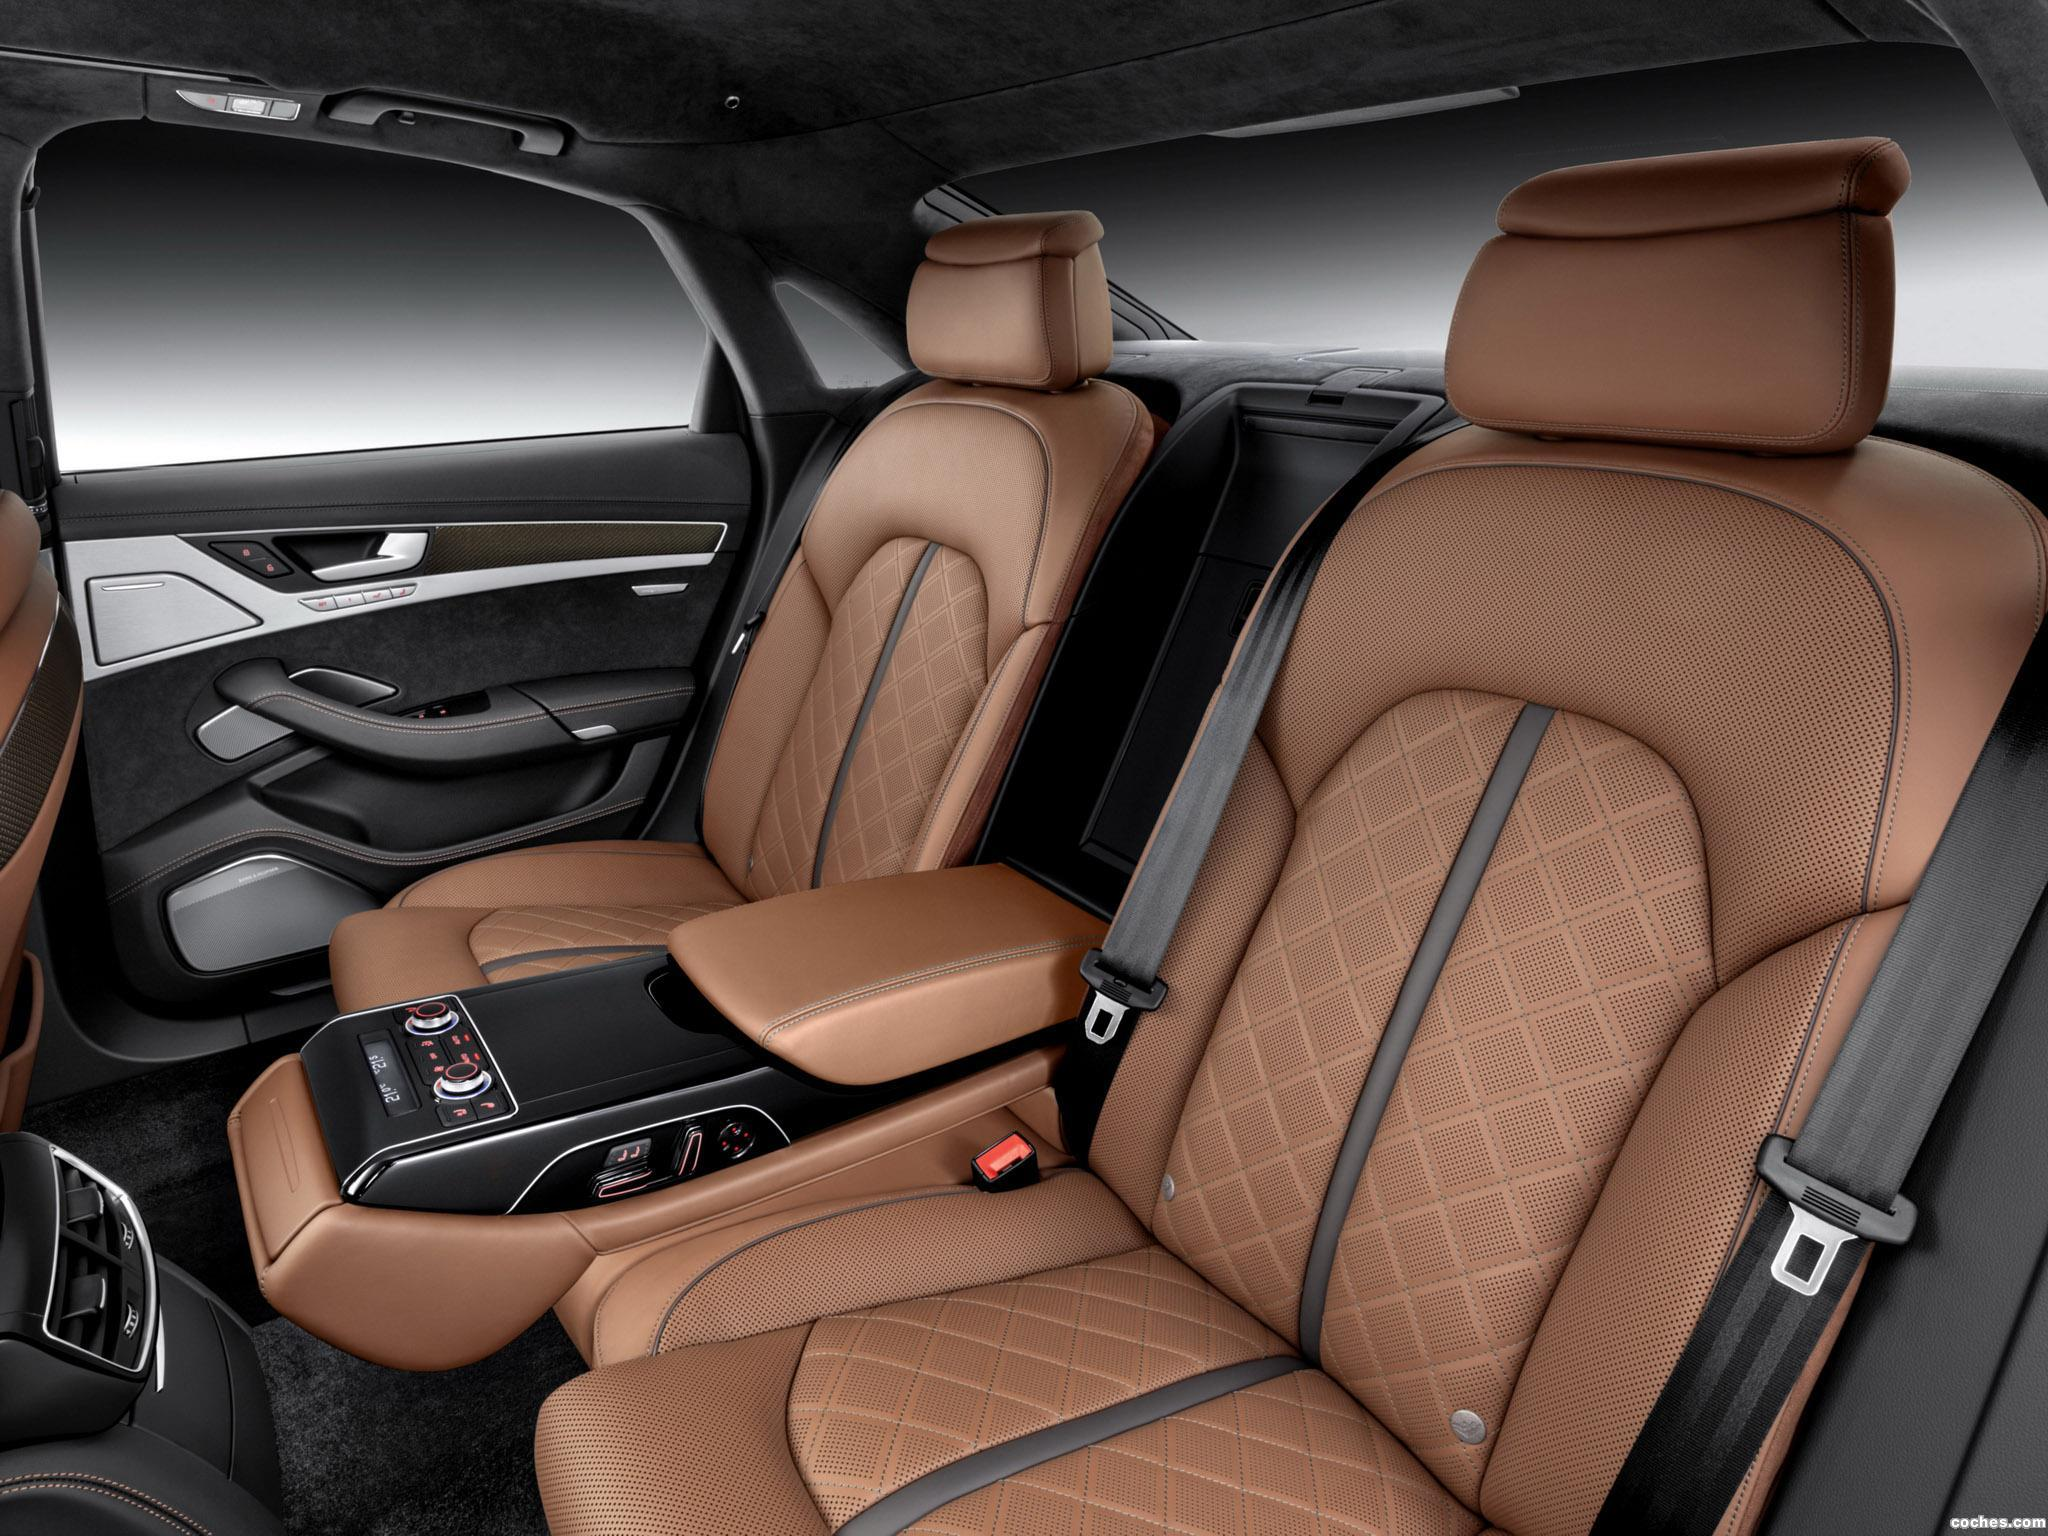 Foto 10 de Audi S8 D4 2013